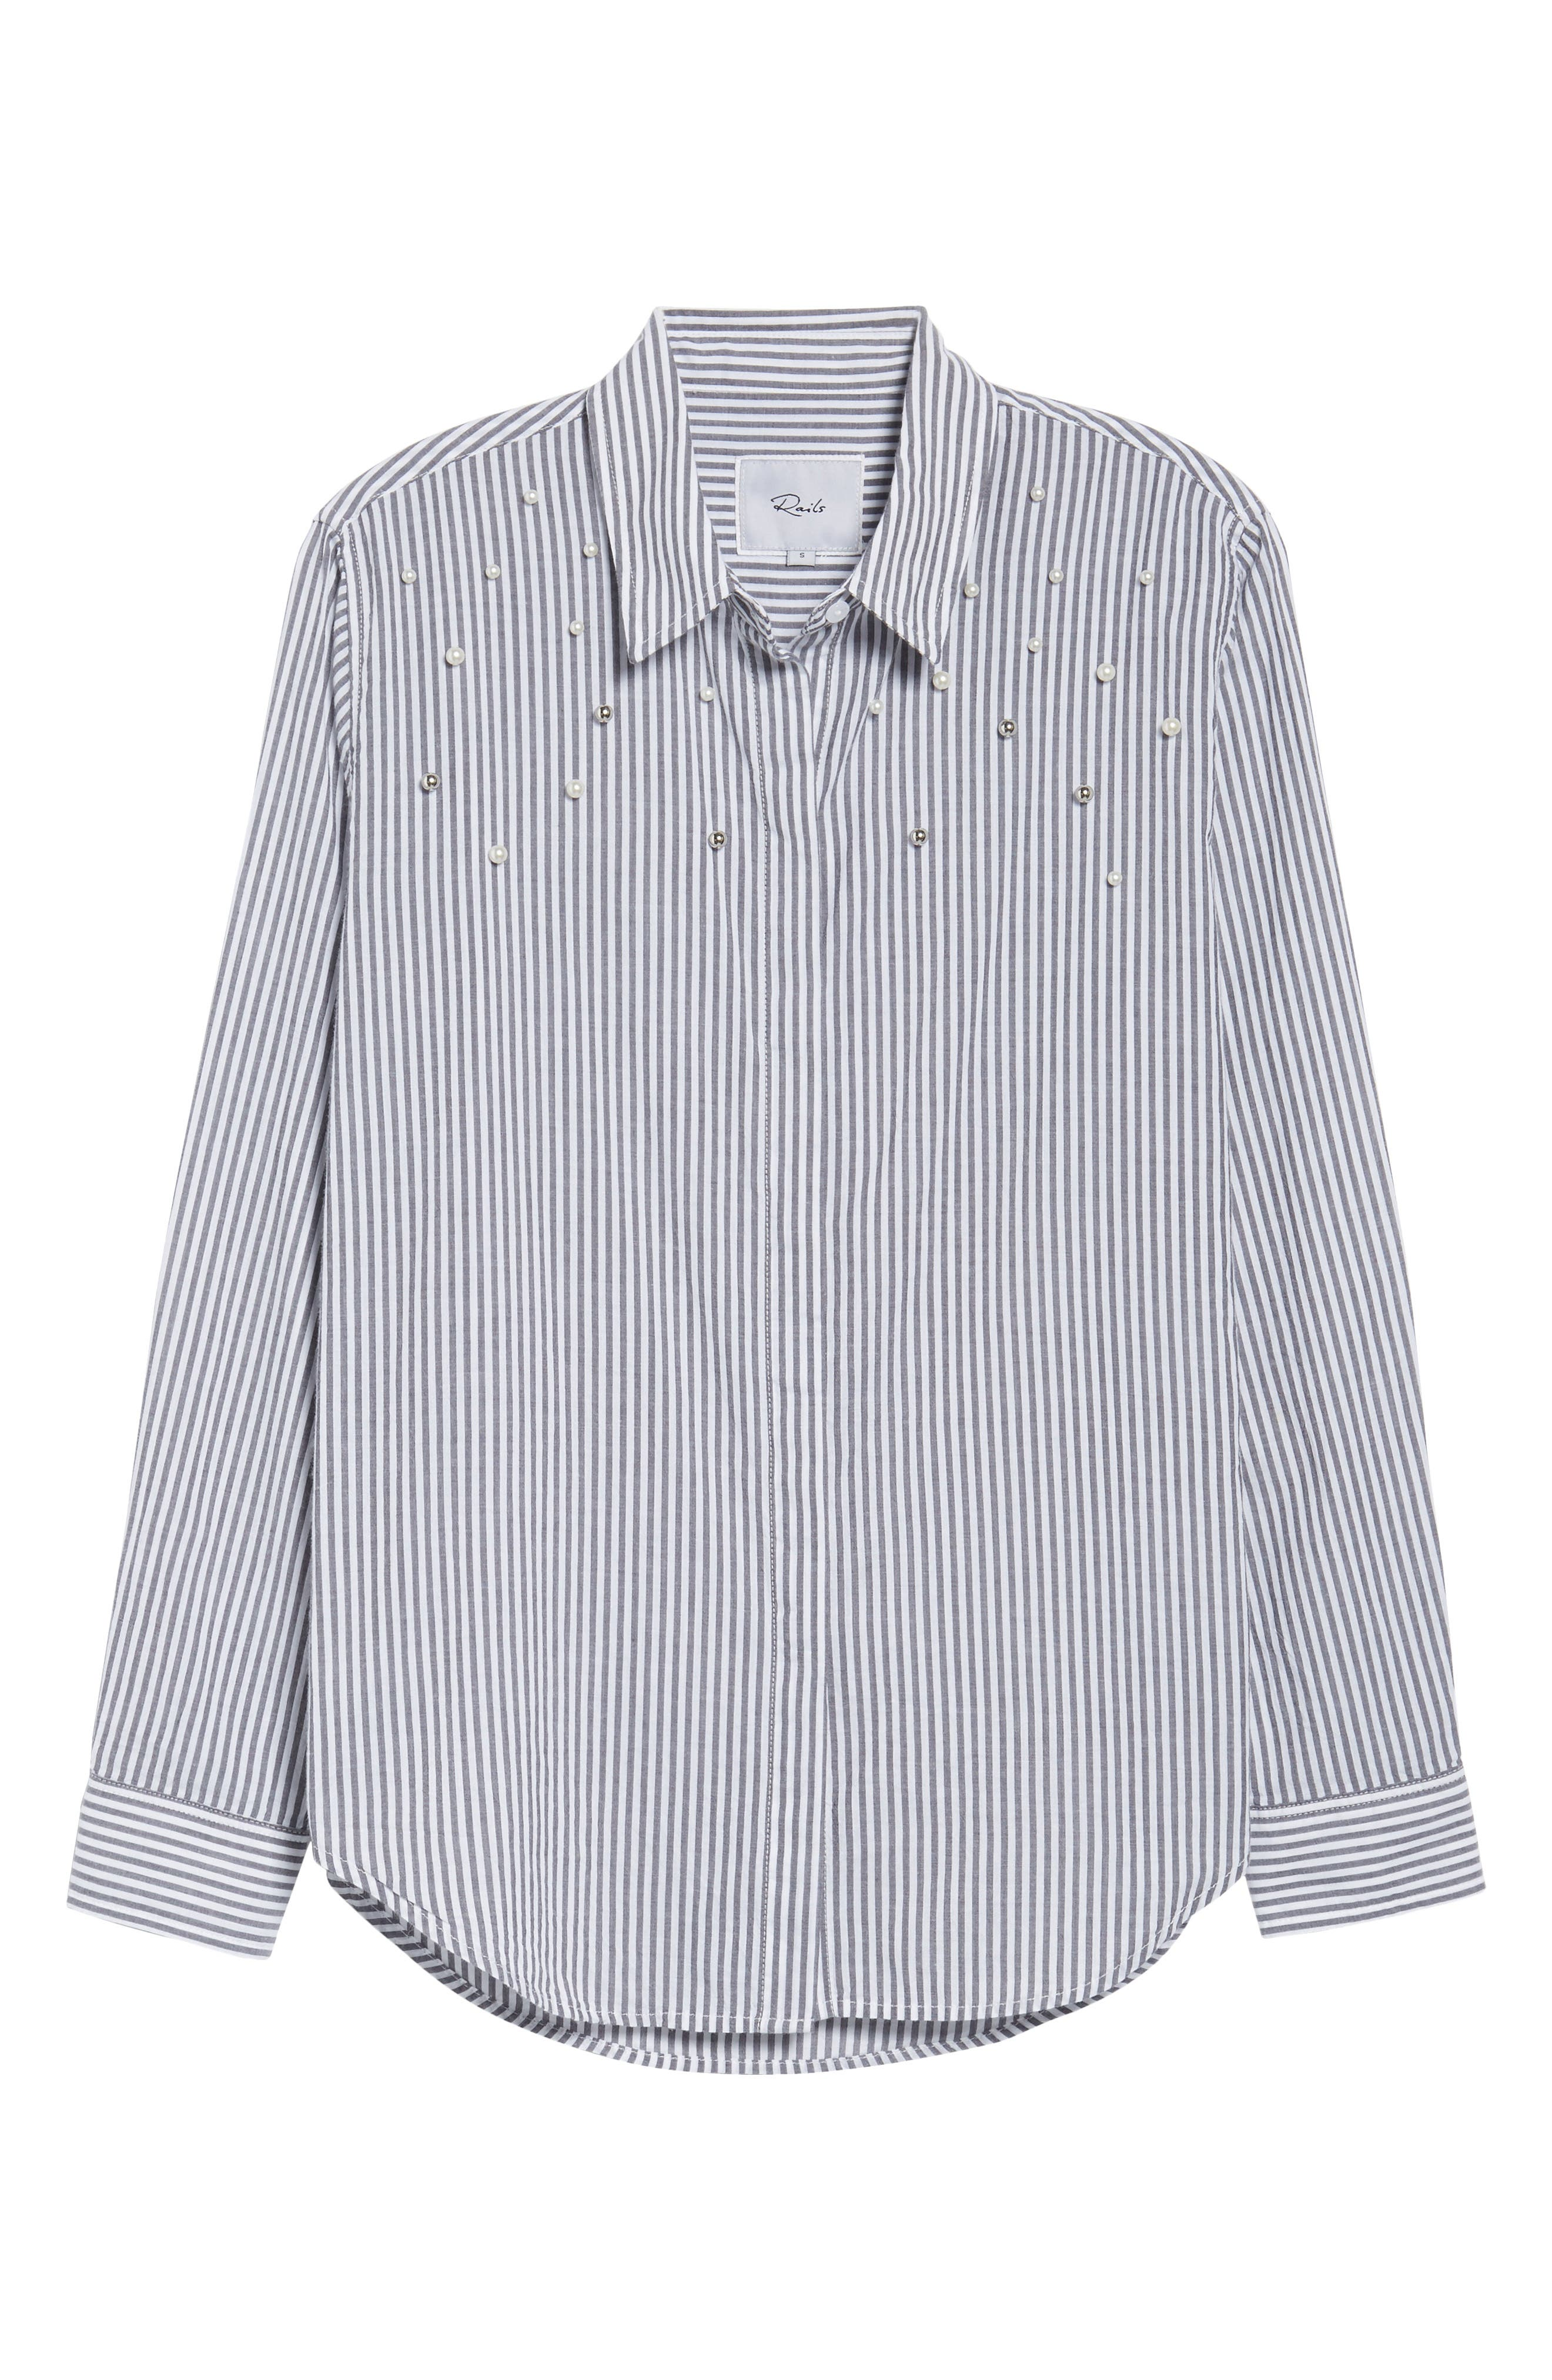 Taylor Embellished Shirt,                             Alternate thumbnail 6, color,                             Florence Stripe Studded Pearls